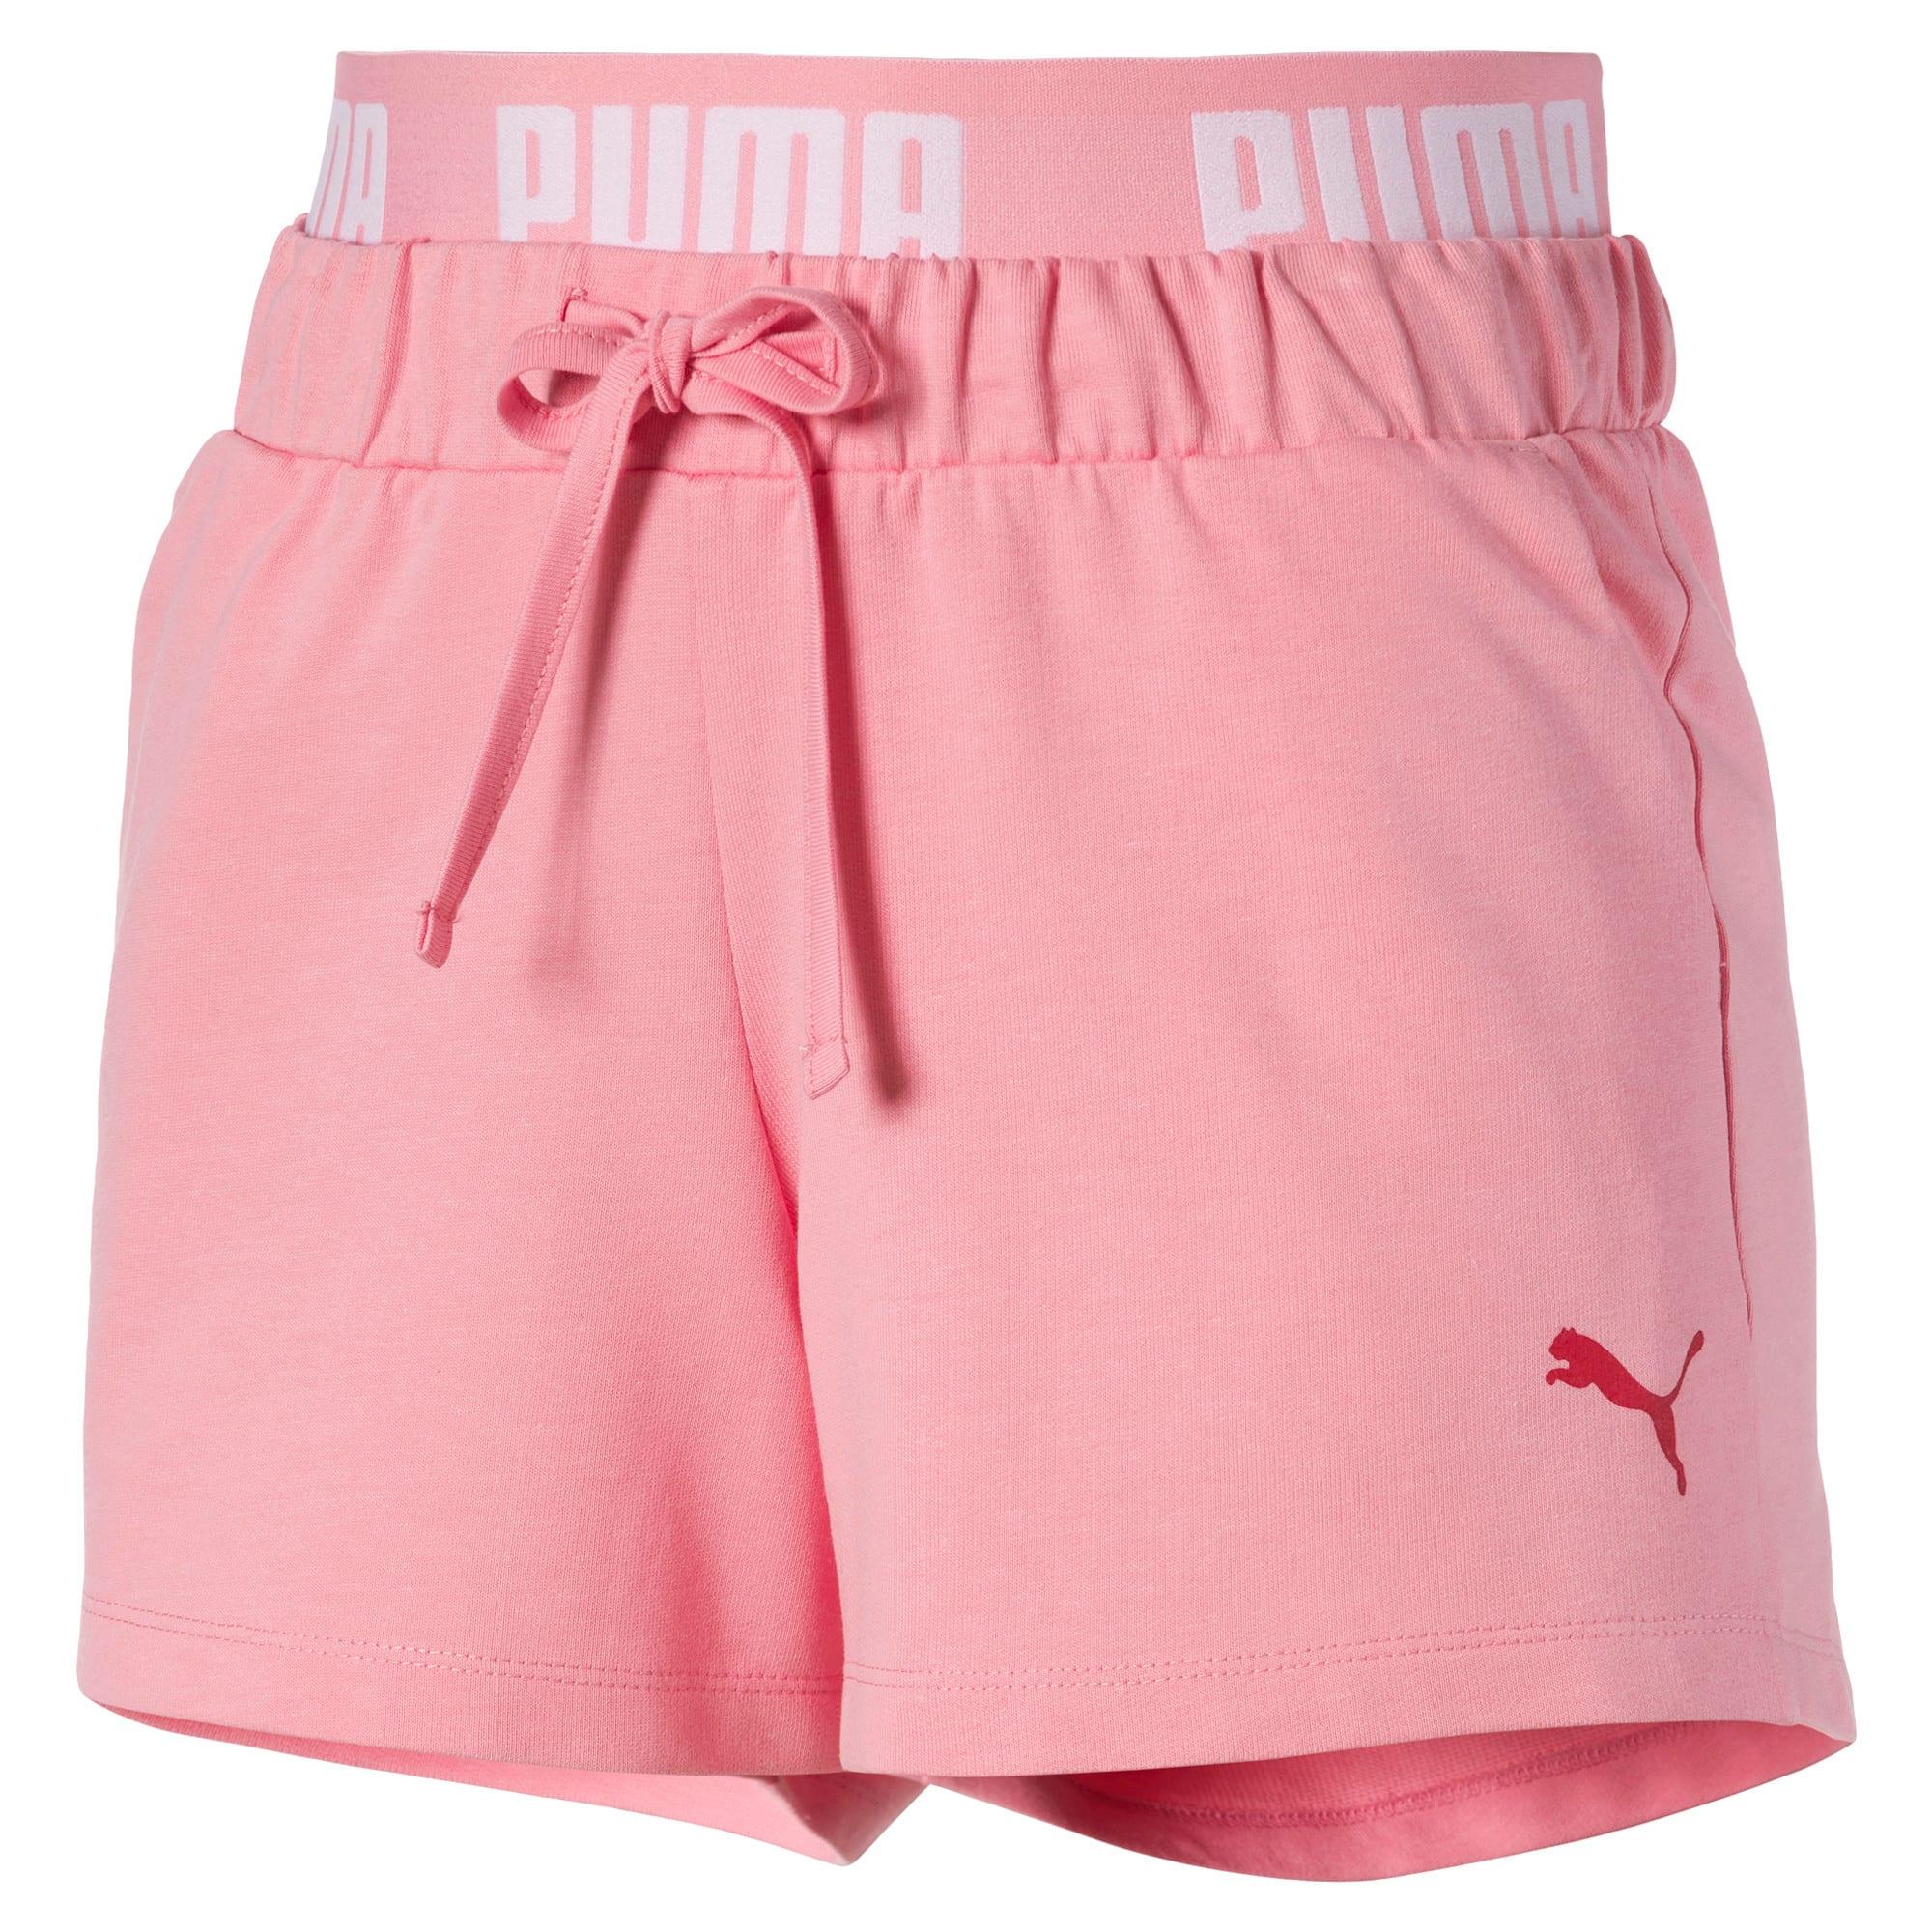 Thumbnail 1 of Women's Shorts, Peony, medium